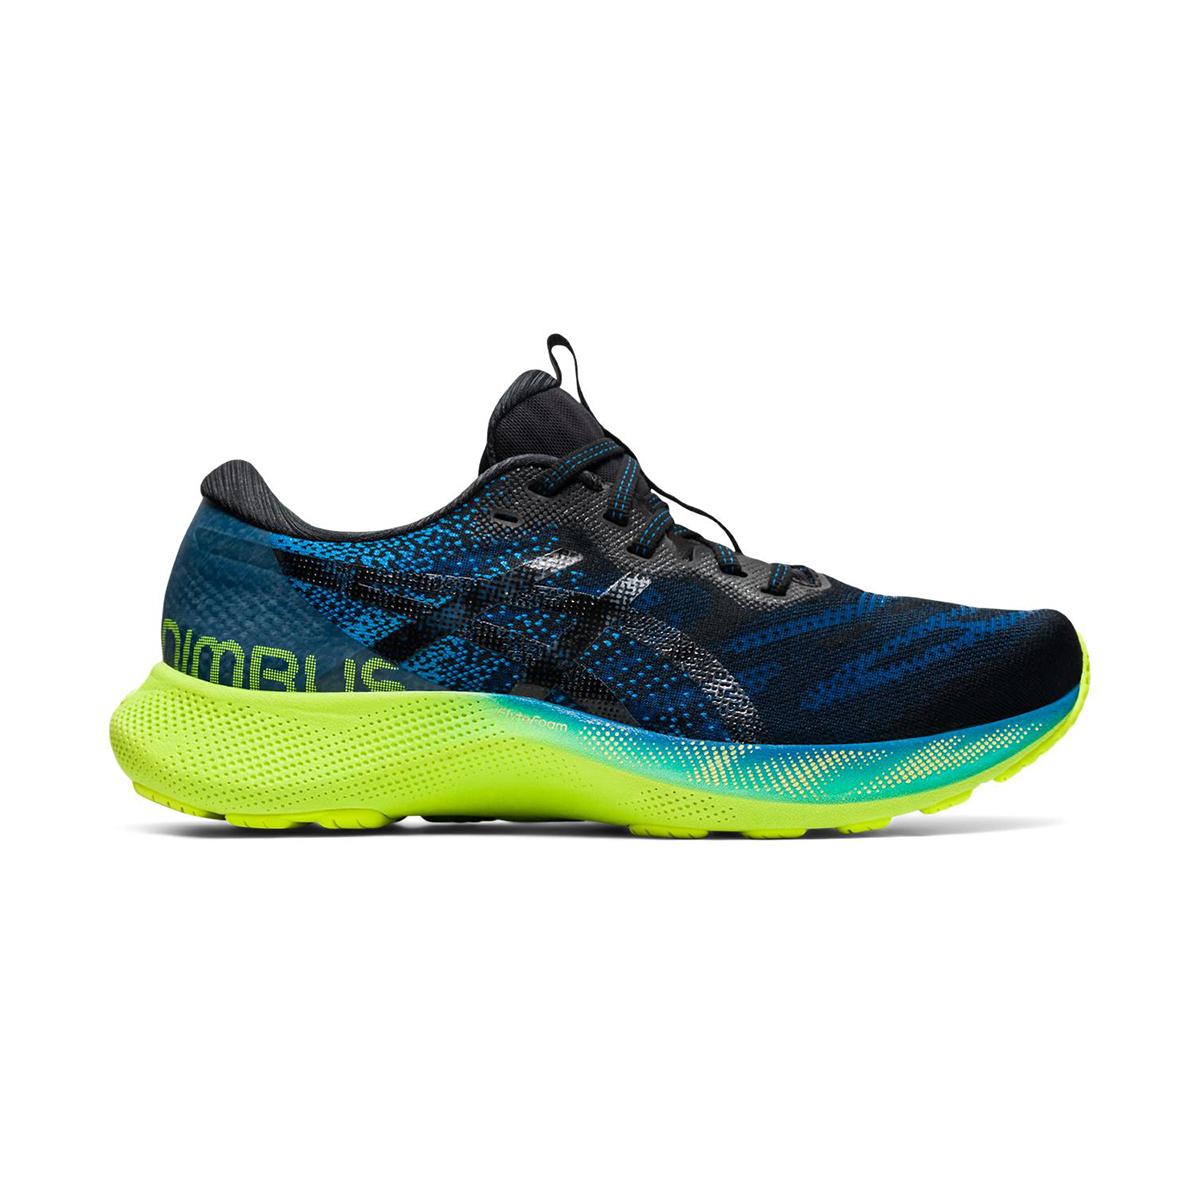 Men's Asics Gel-Nimbus Lite 2 Running Shoe - Color: Reborn Blue/Black - Size: 7 - Width: Regular, Reborn Blue/Black, large, image 1